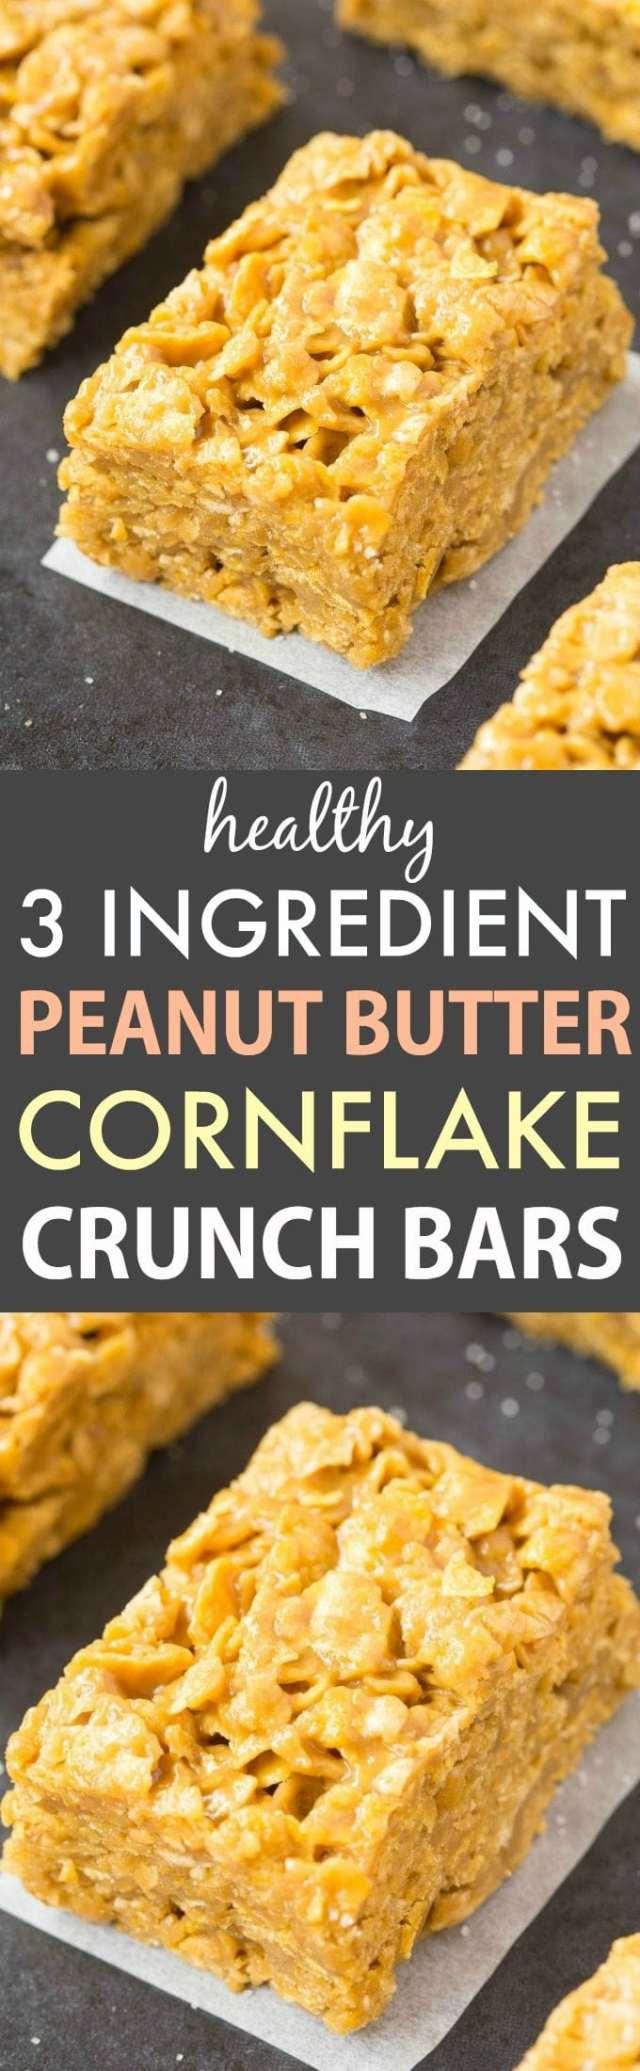 3 Ingredient No Bake Peanut Butter Corn Flake Cereal Crunch Bars